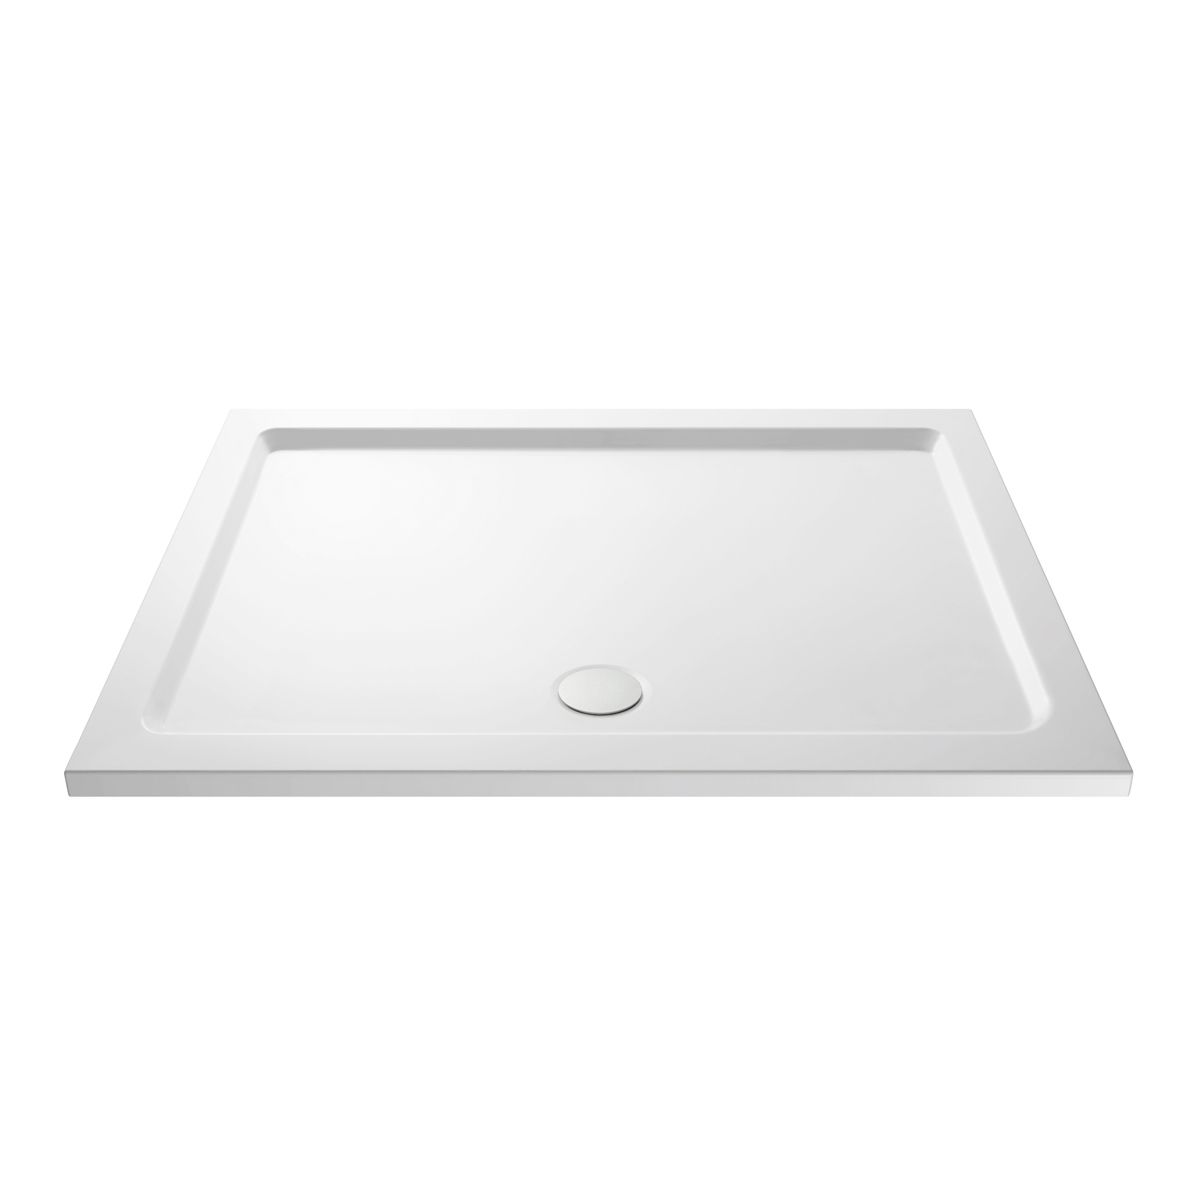 Cassellie Rectangular Shower Tray 1700 x 700mm